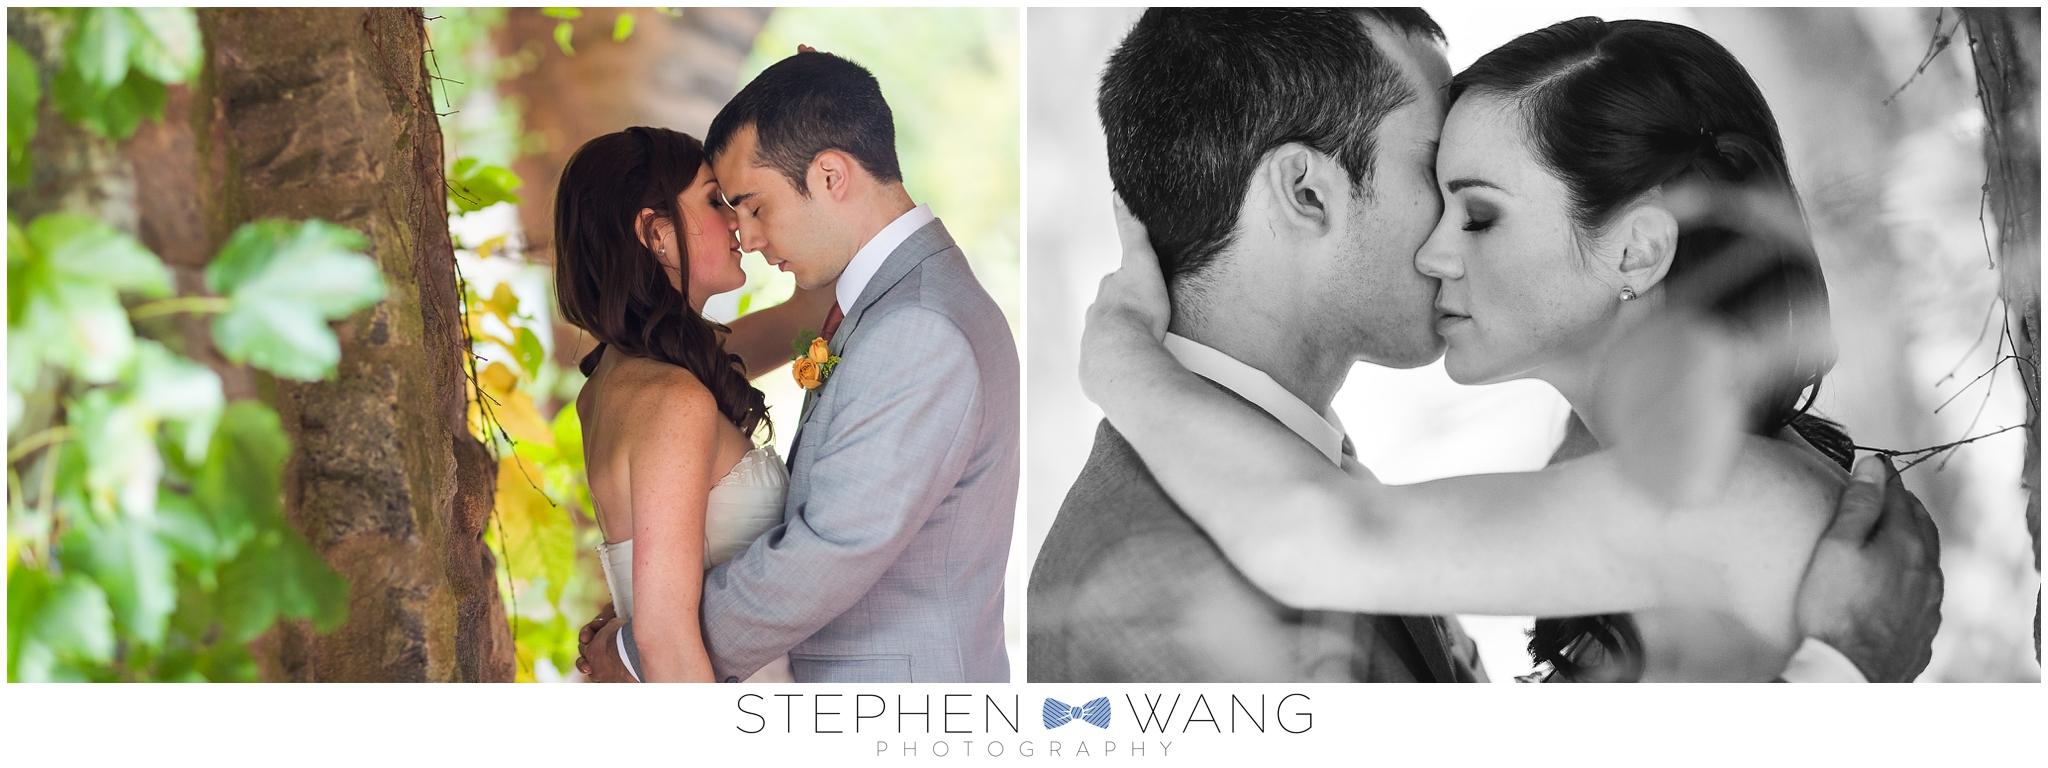 Stephen Wang Photography wedding connecticut deep river lace factory wedding photography connecticut photographer-01-22_0013.jpg